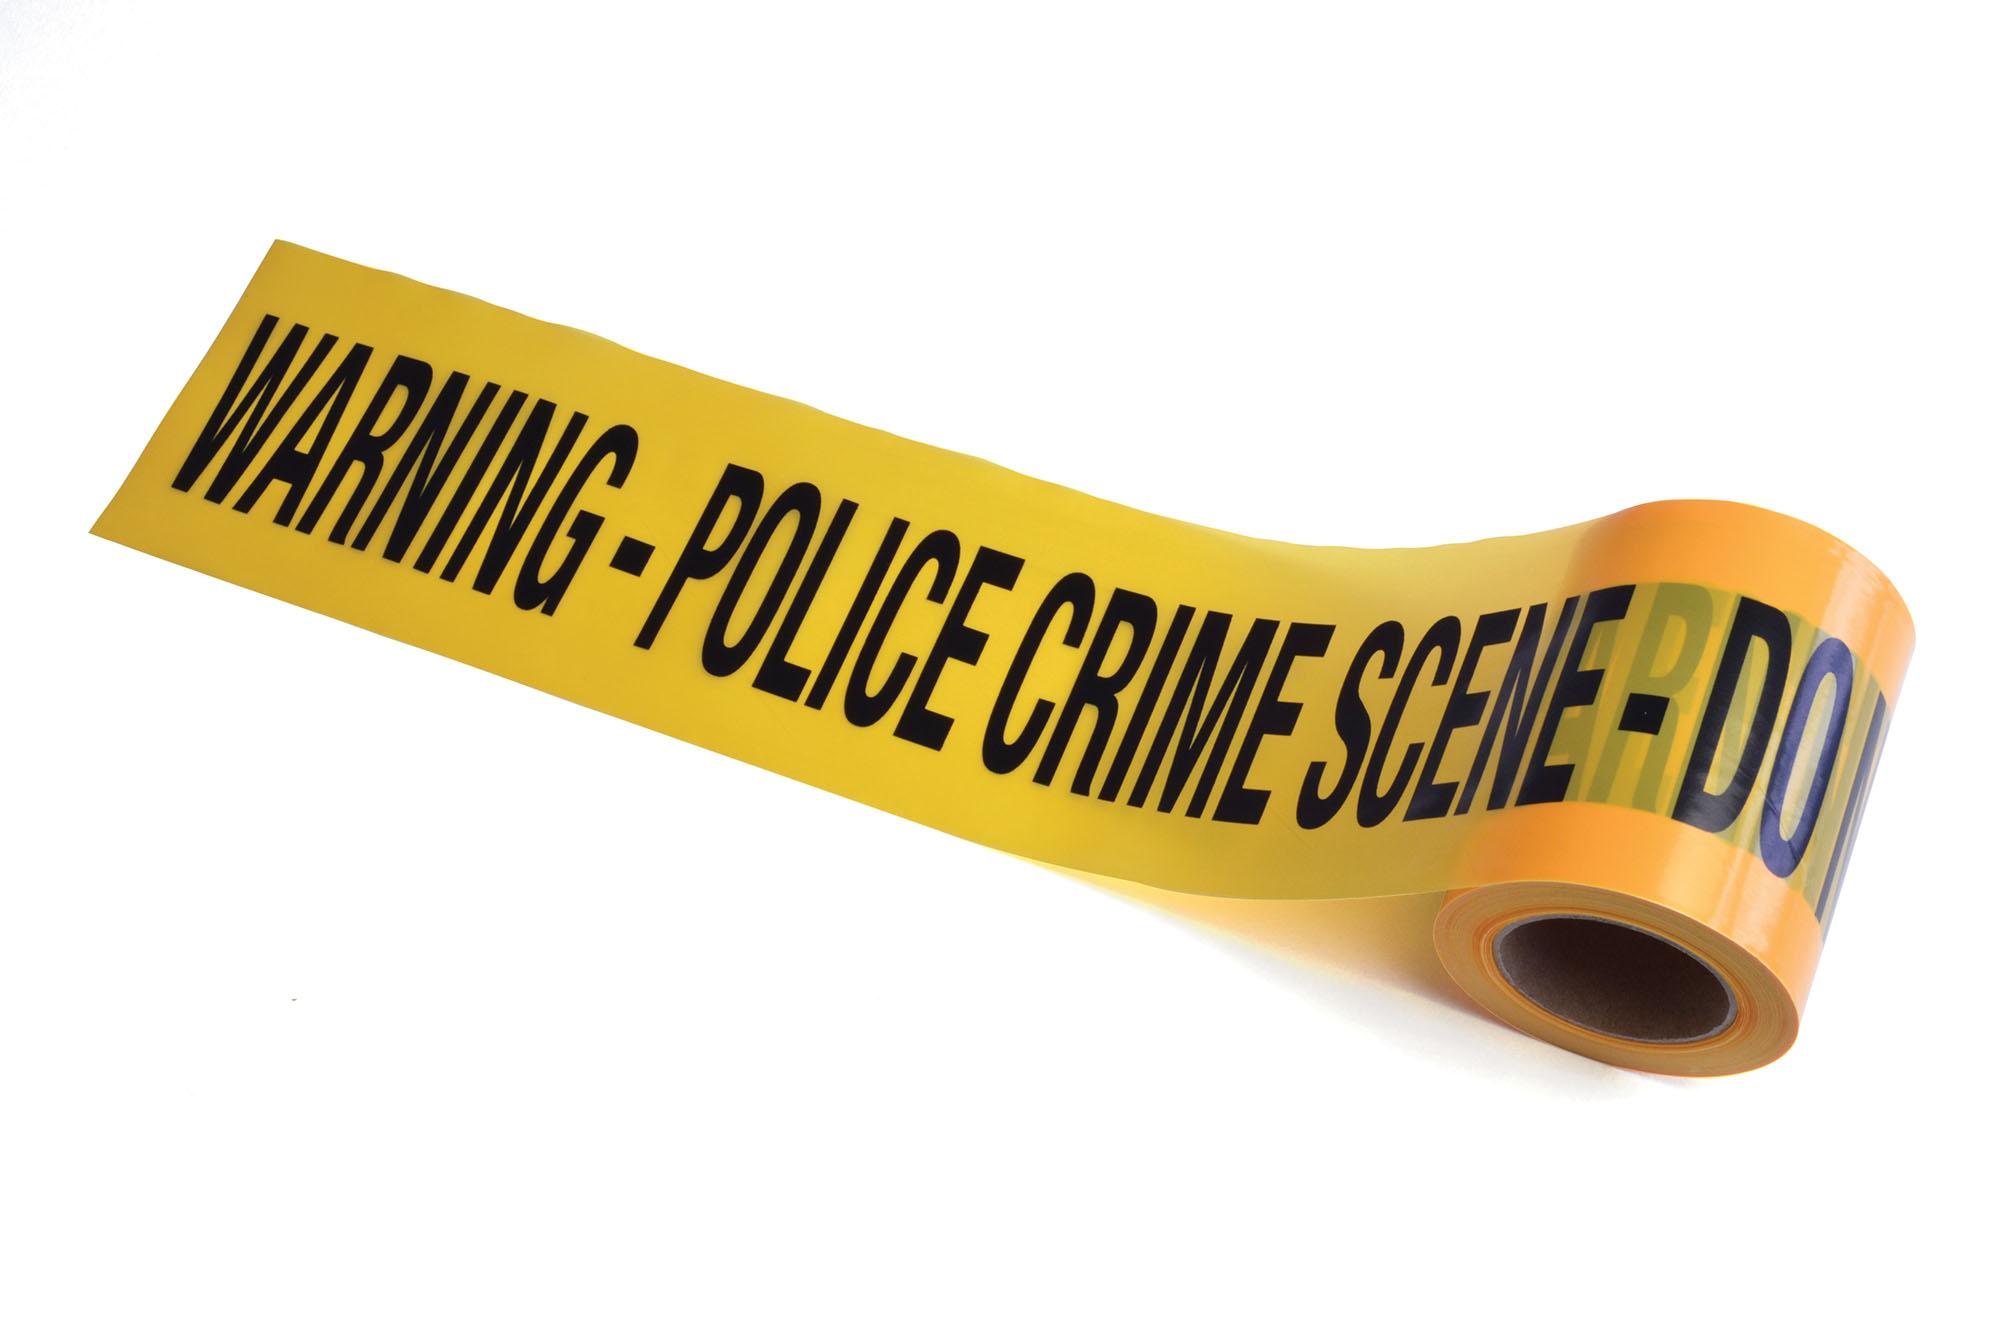 poliisi tutkintanauha